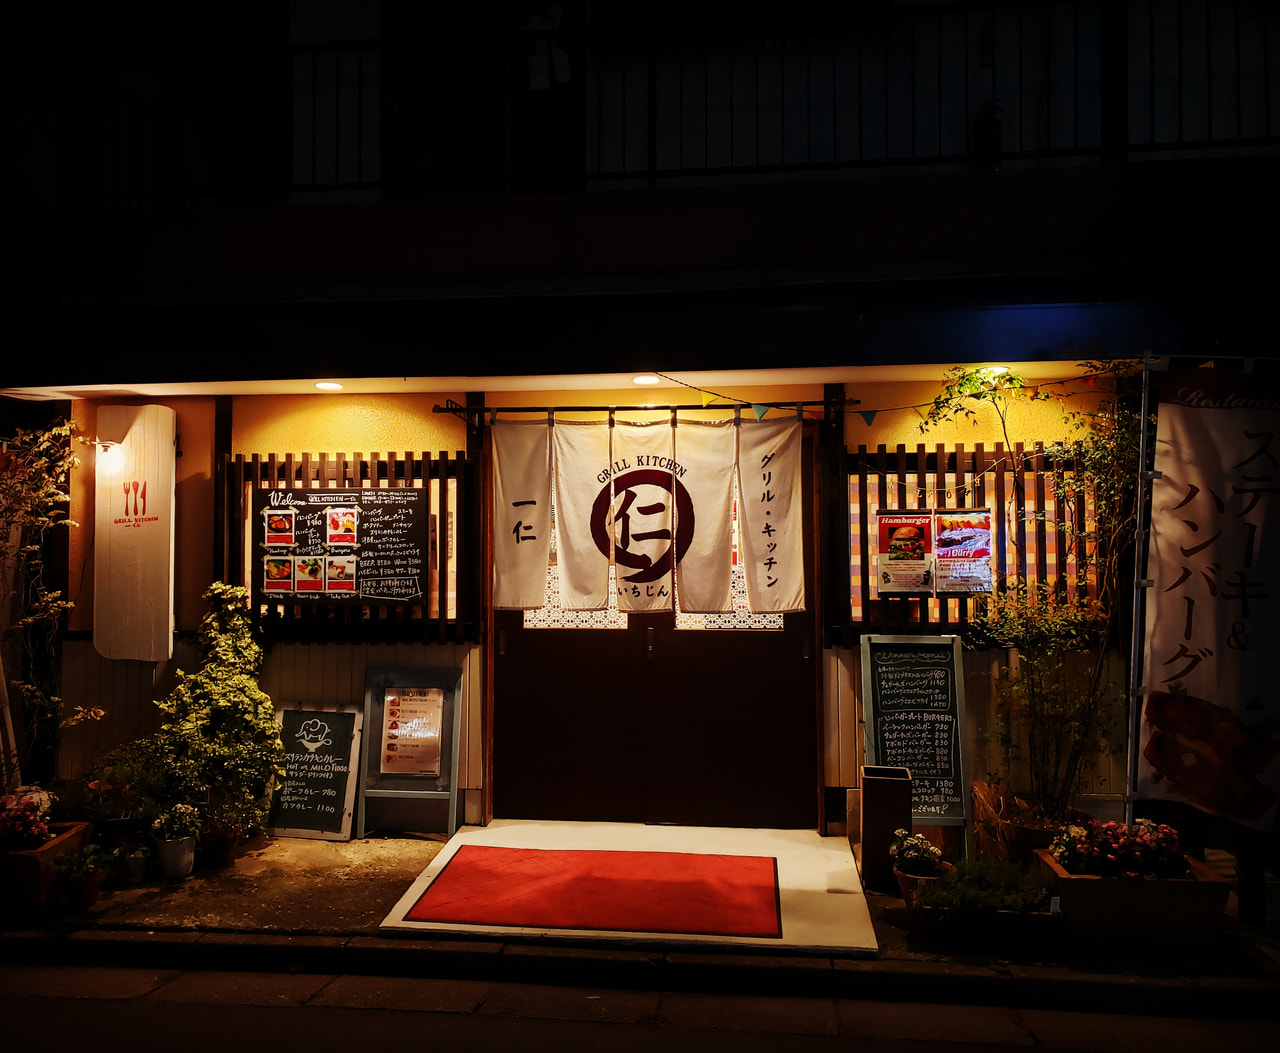 GRILL KITCHEN 一仁(いちじん)(新座市)のお店の外観